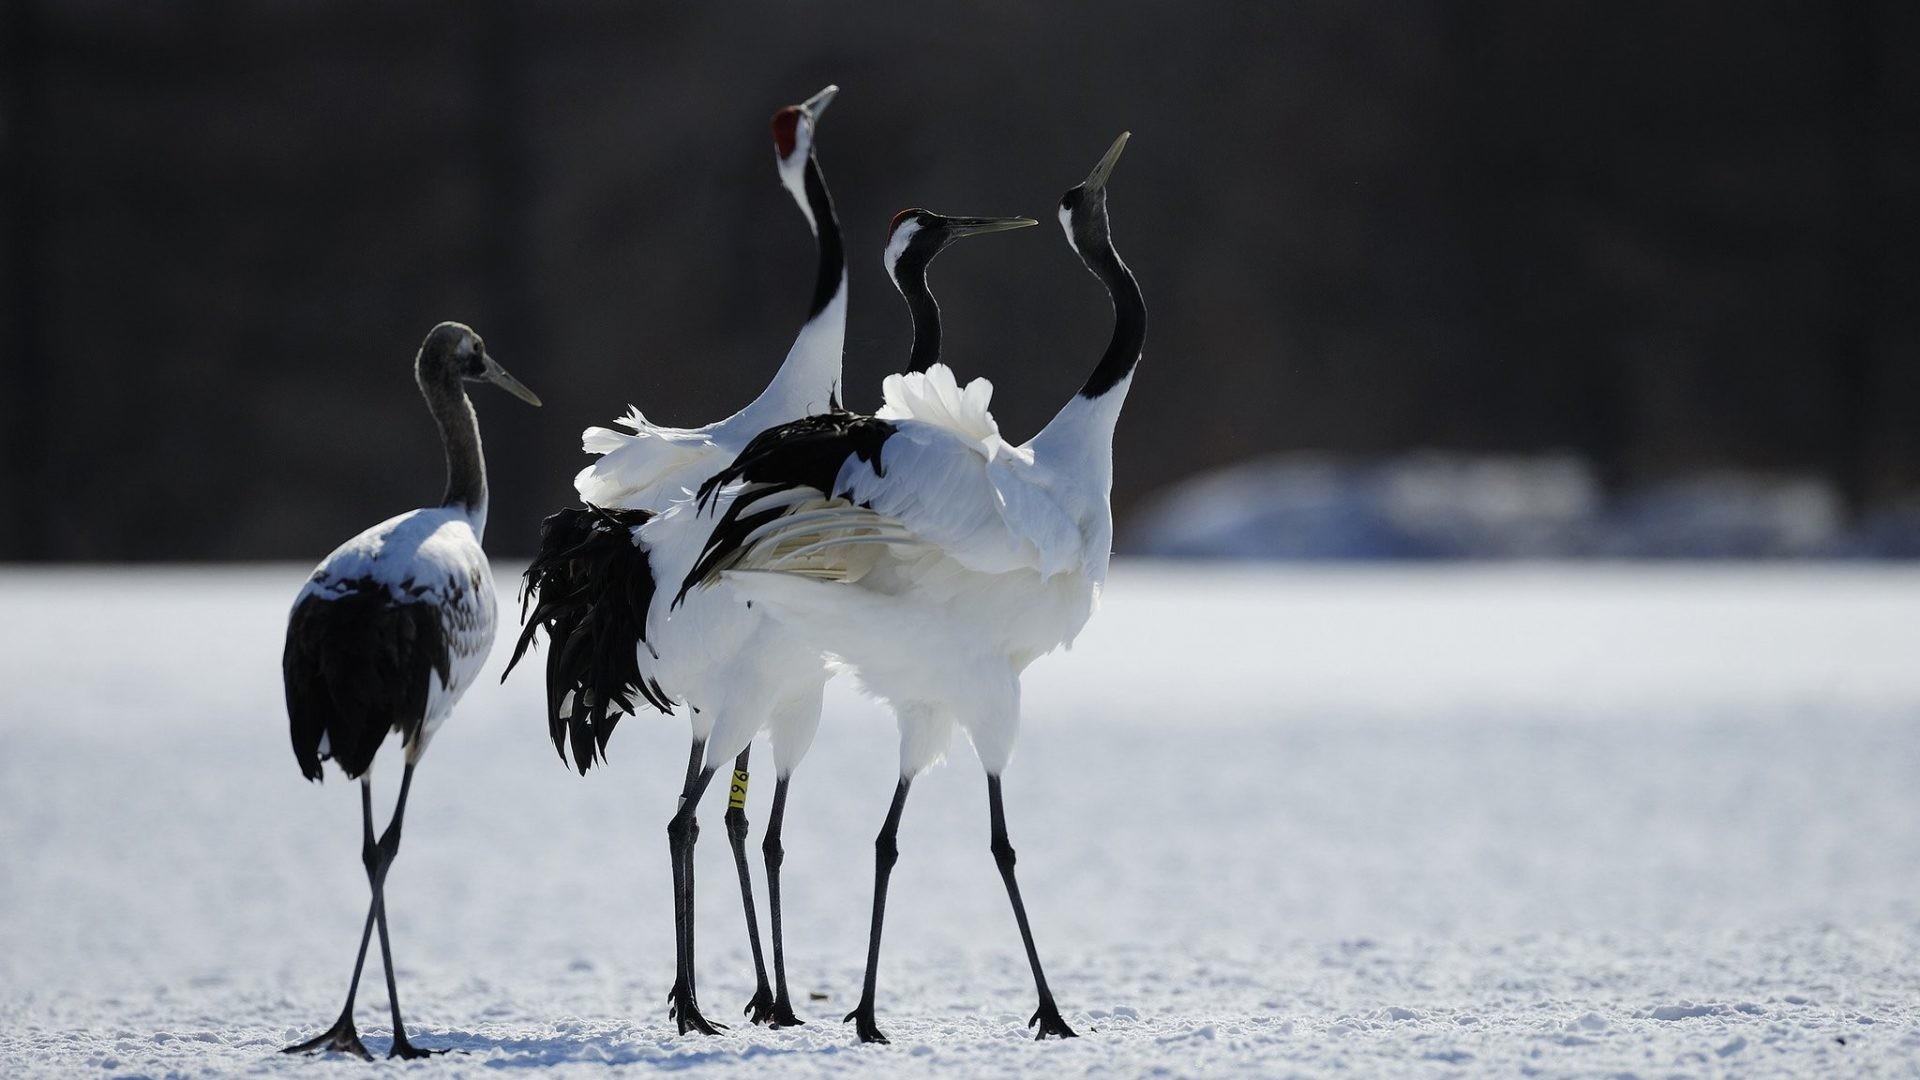 Res: 1920x1080, Heron Tag - Heron Dance Dancing Animals Flock Crane Winter Birds Photos  Love for HD 16